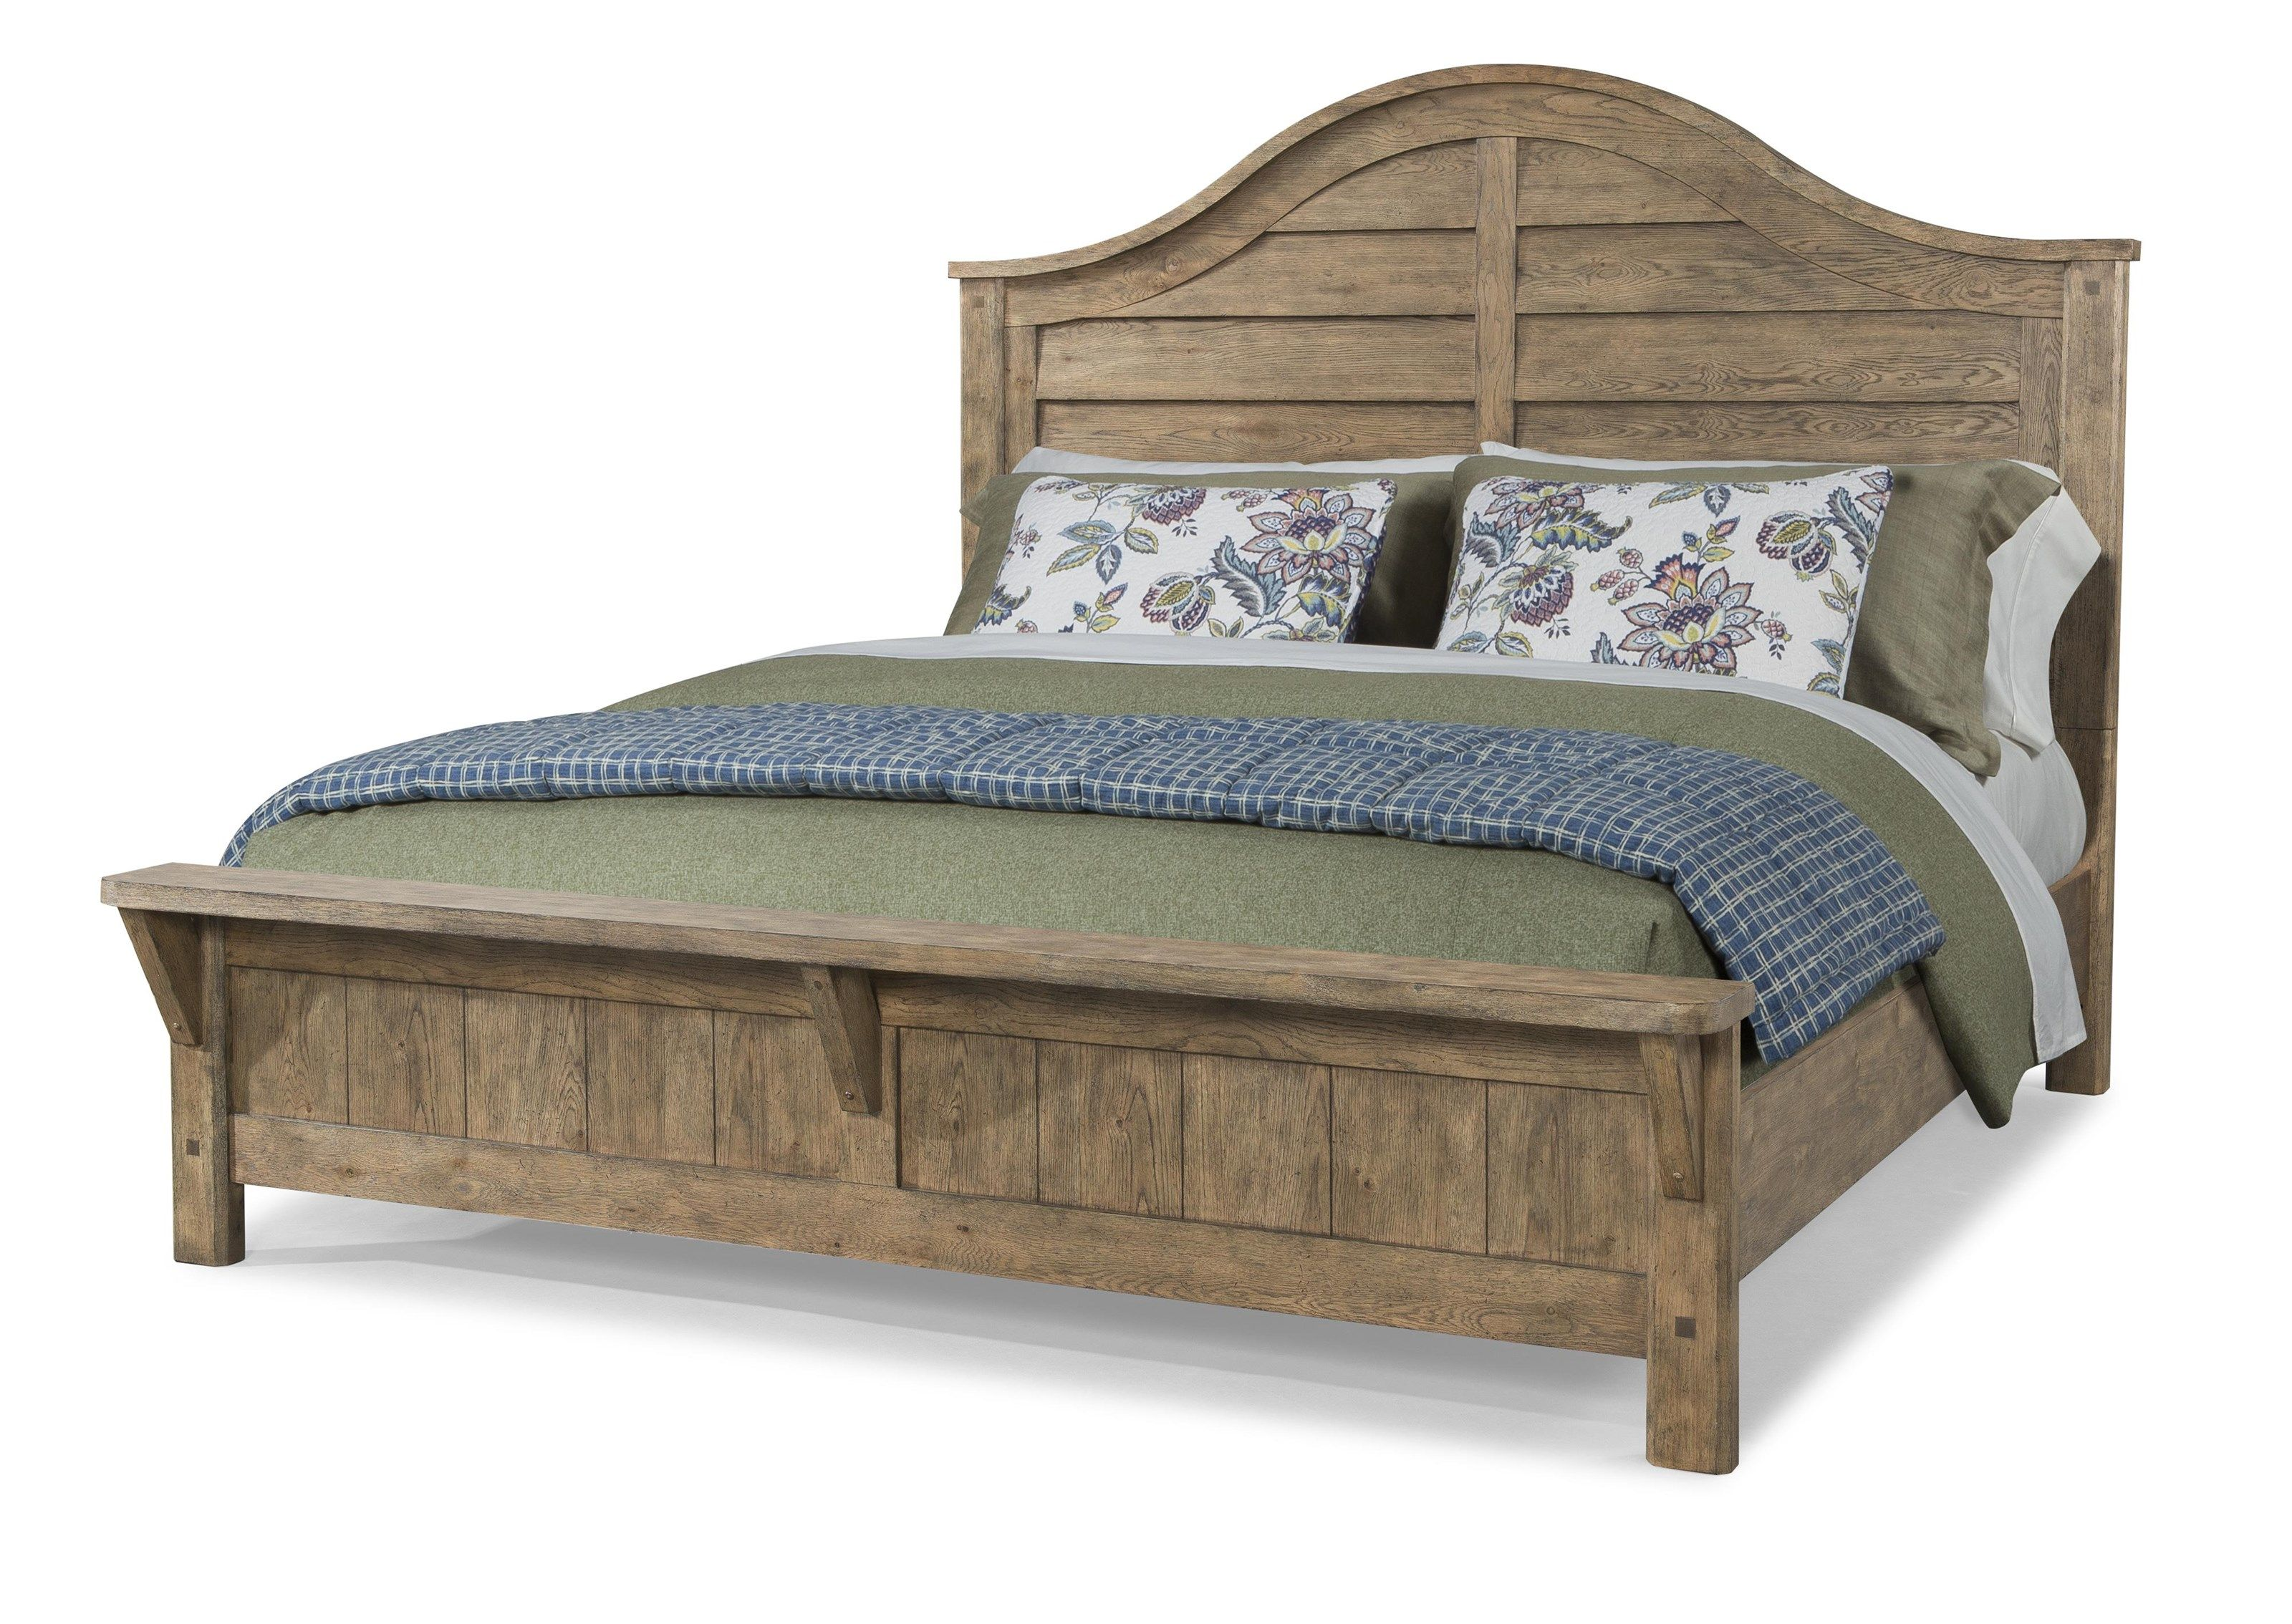 River Falls River Falls King Bed By Morris Home Furnishings Morris Homes Bed Morris Furniture